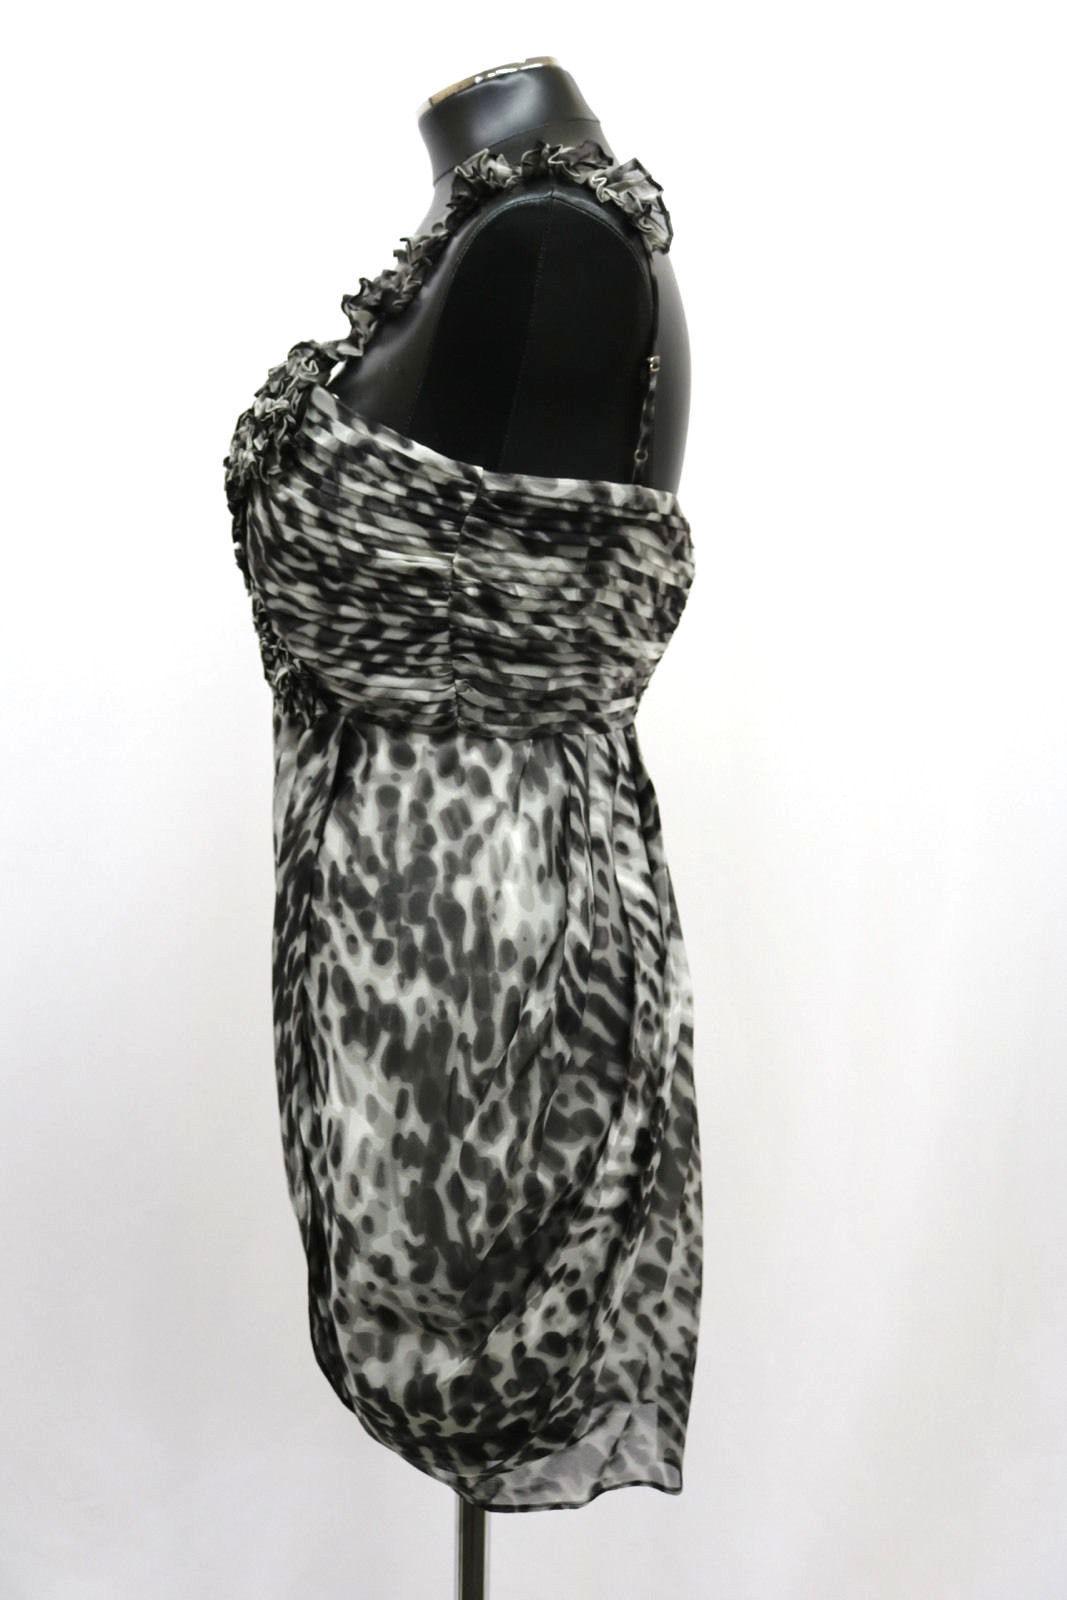 BCBG MAX AZRIA Dress One Shoulder Silk Rosette Chiffon Black combo Size 4 MyAFC